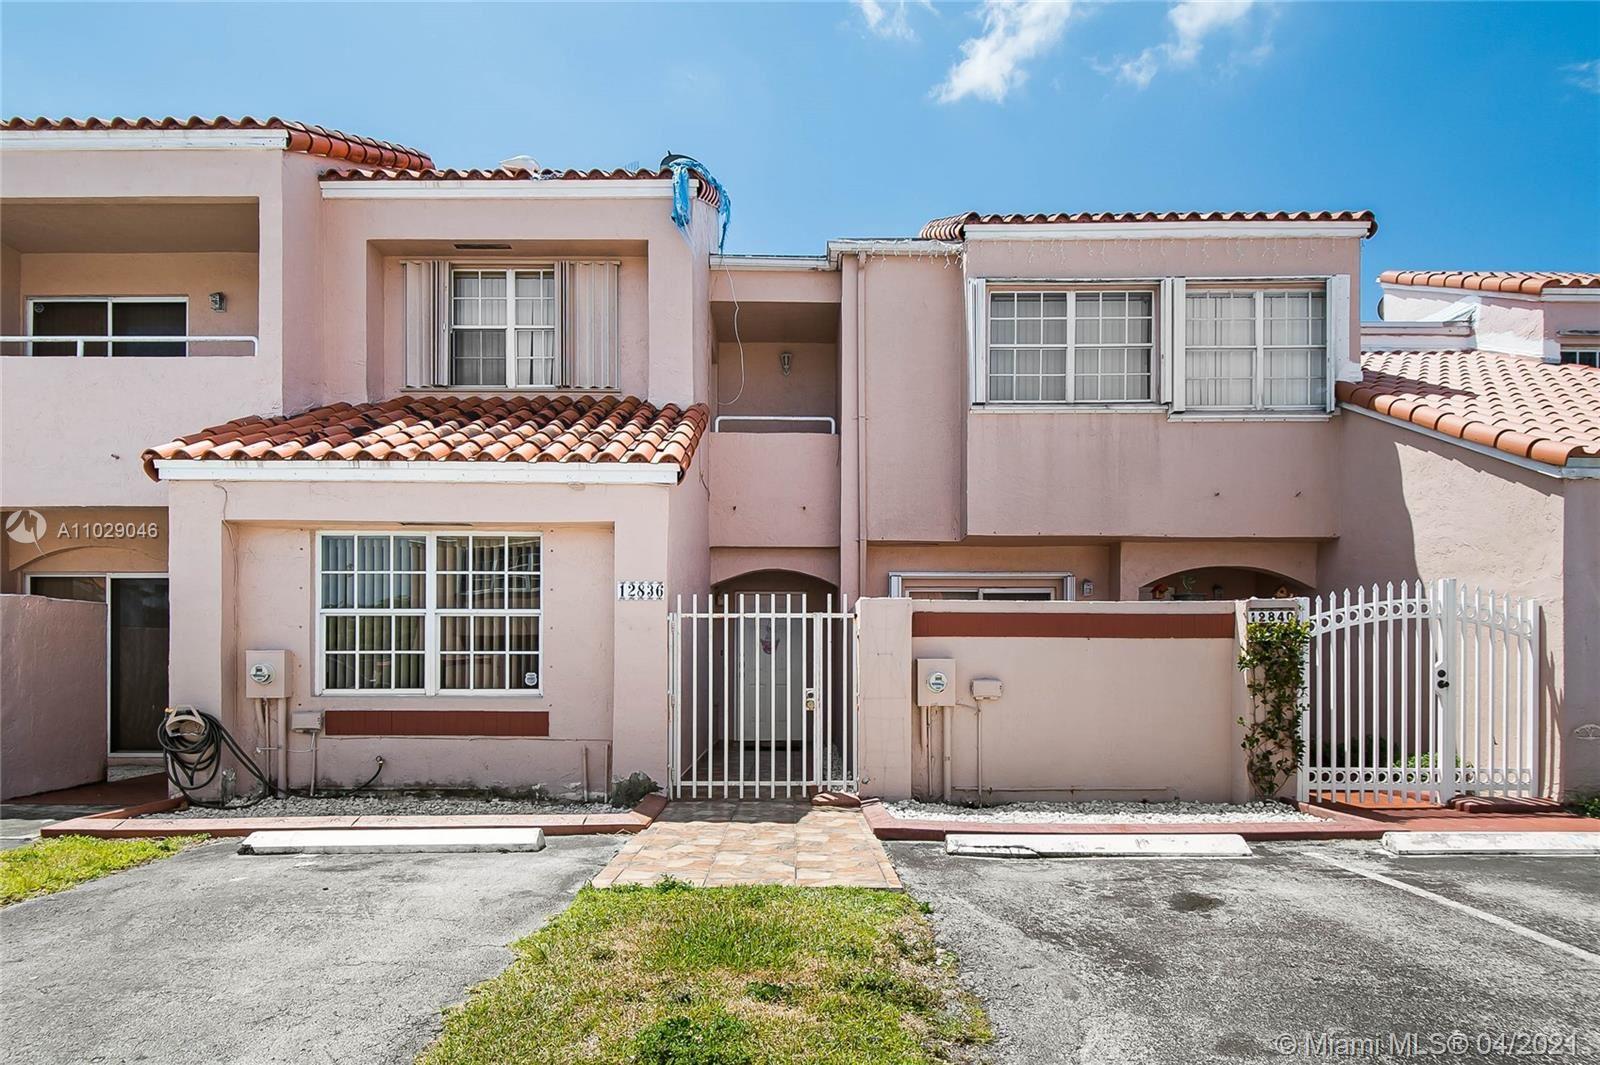 12836 SW 62nd Ln, Miami, FL 33183 - #: A11029046